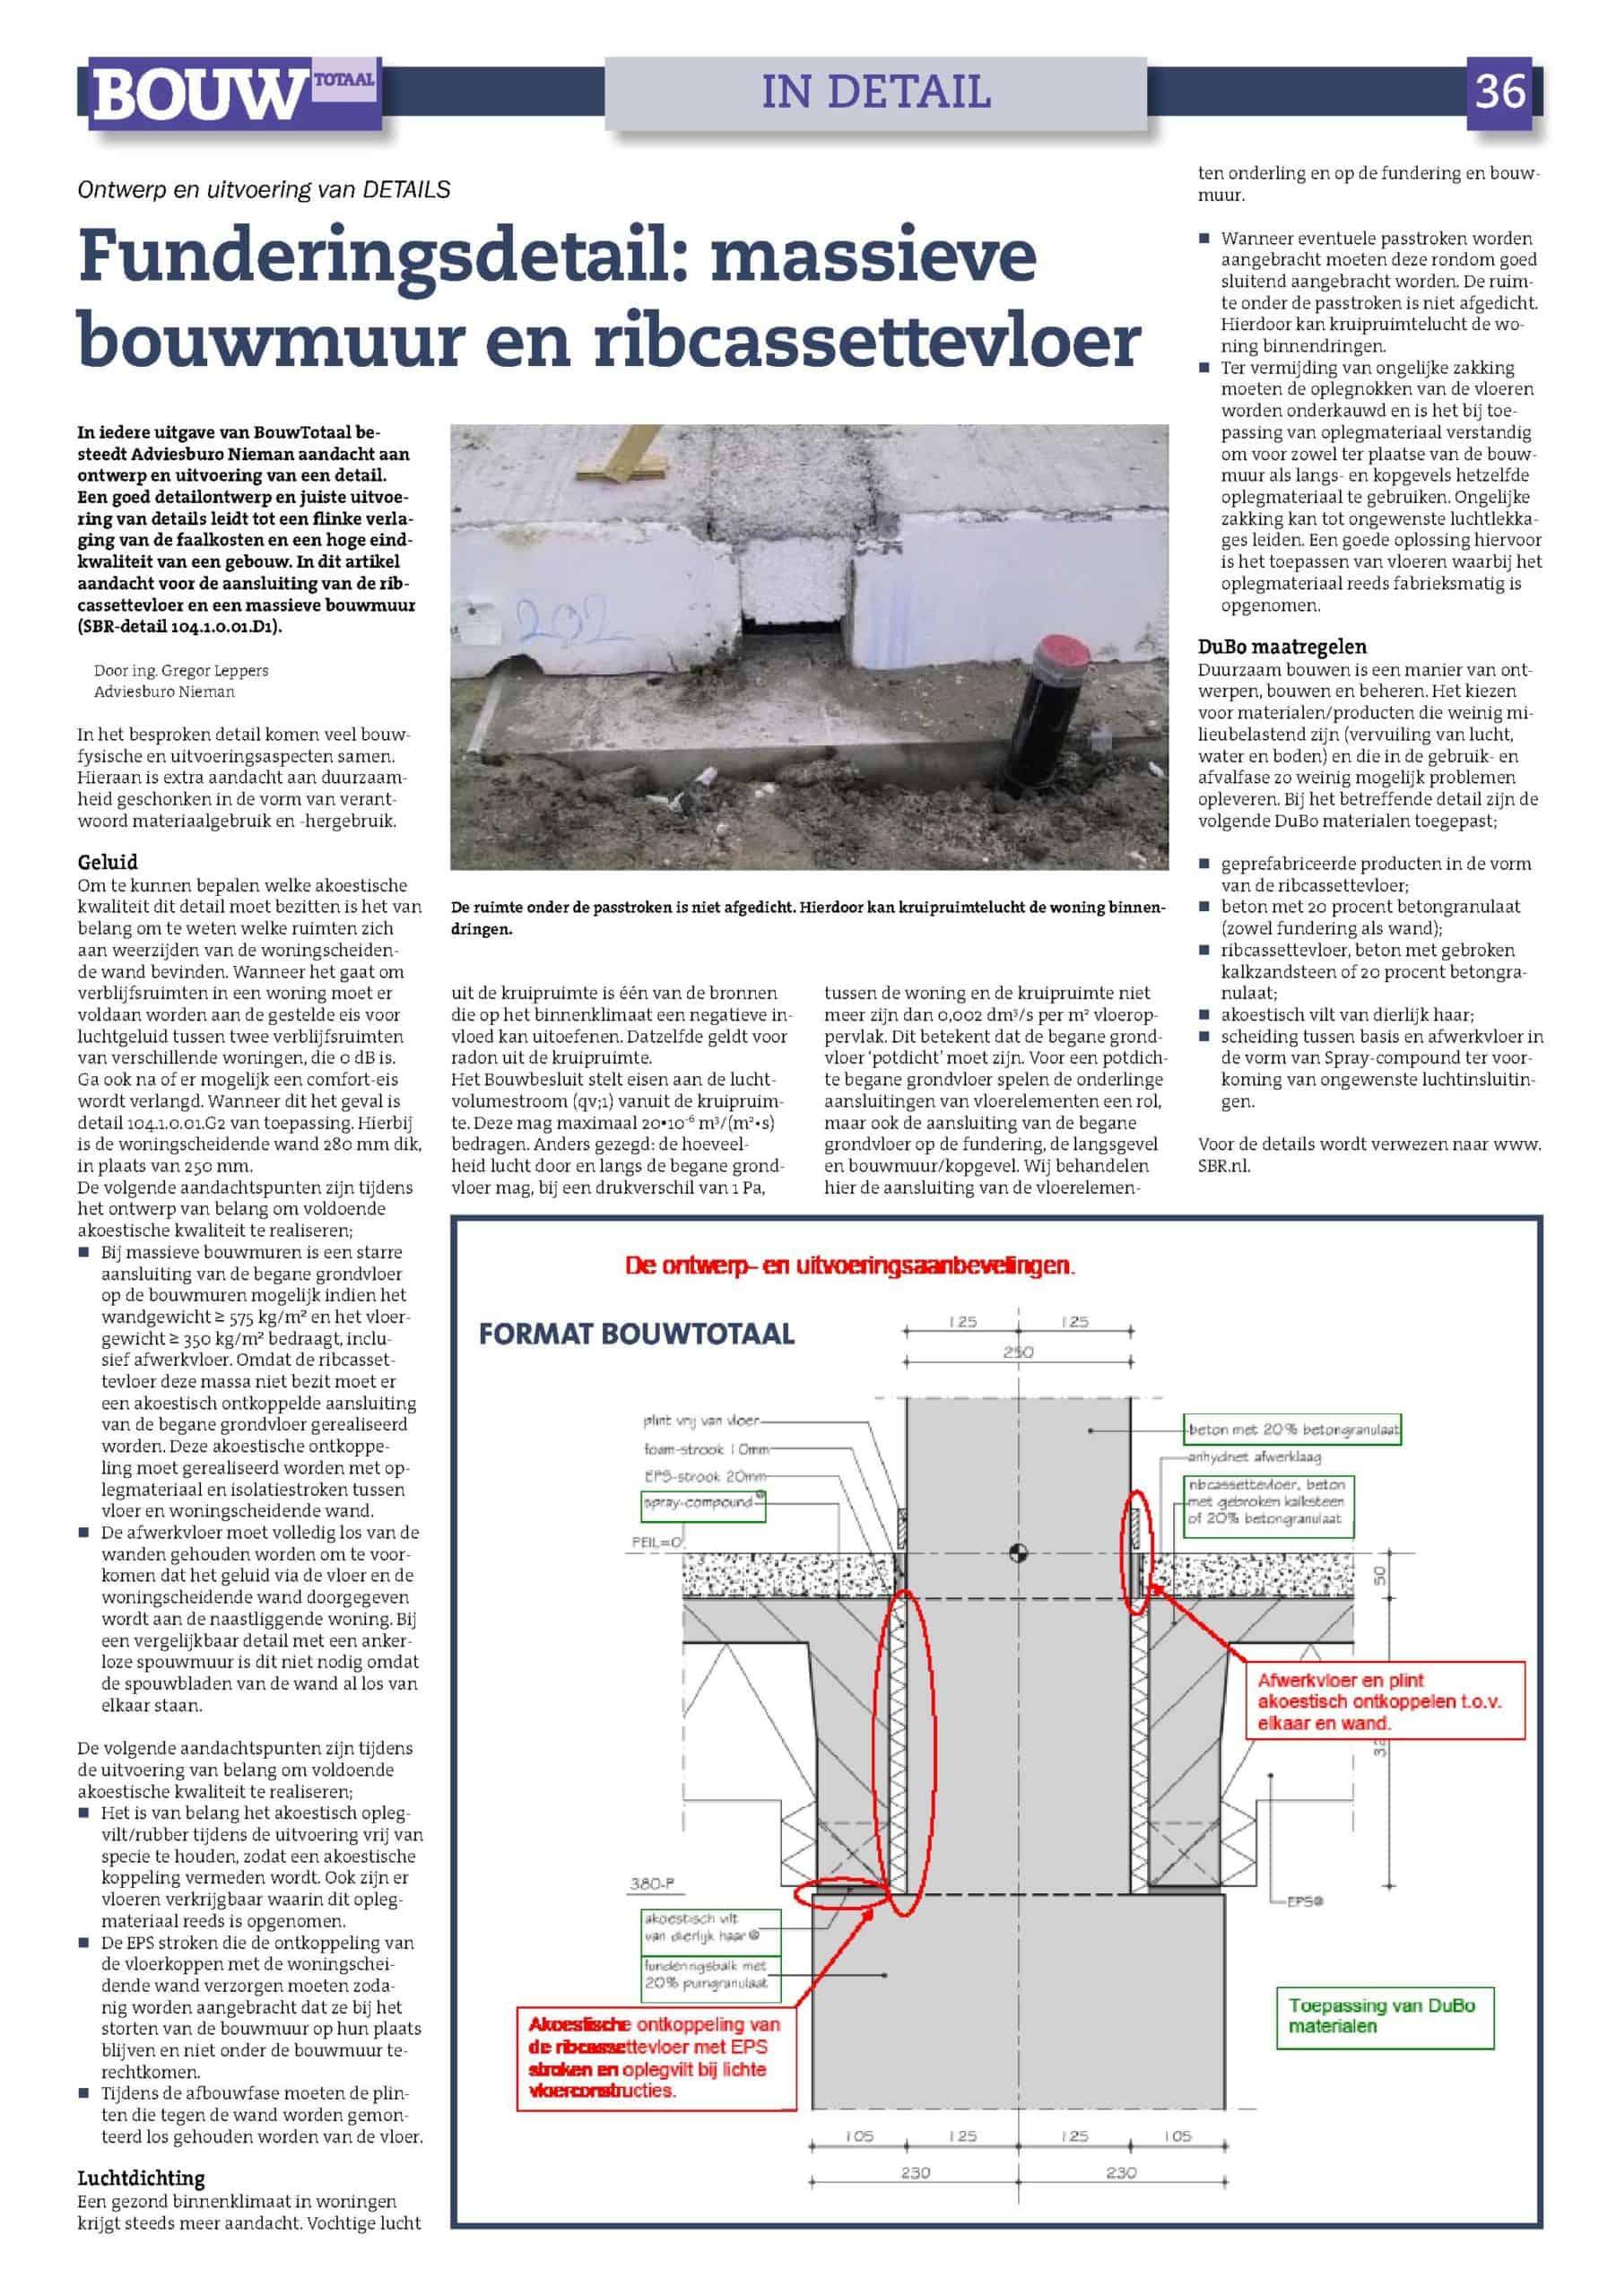 Bouwtotaal_BT.09.10.Detail_Funderingsdetail-massieve-bouwmuur-en-ribcassette-vloer_GLe-3-scaled